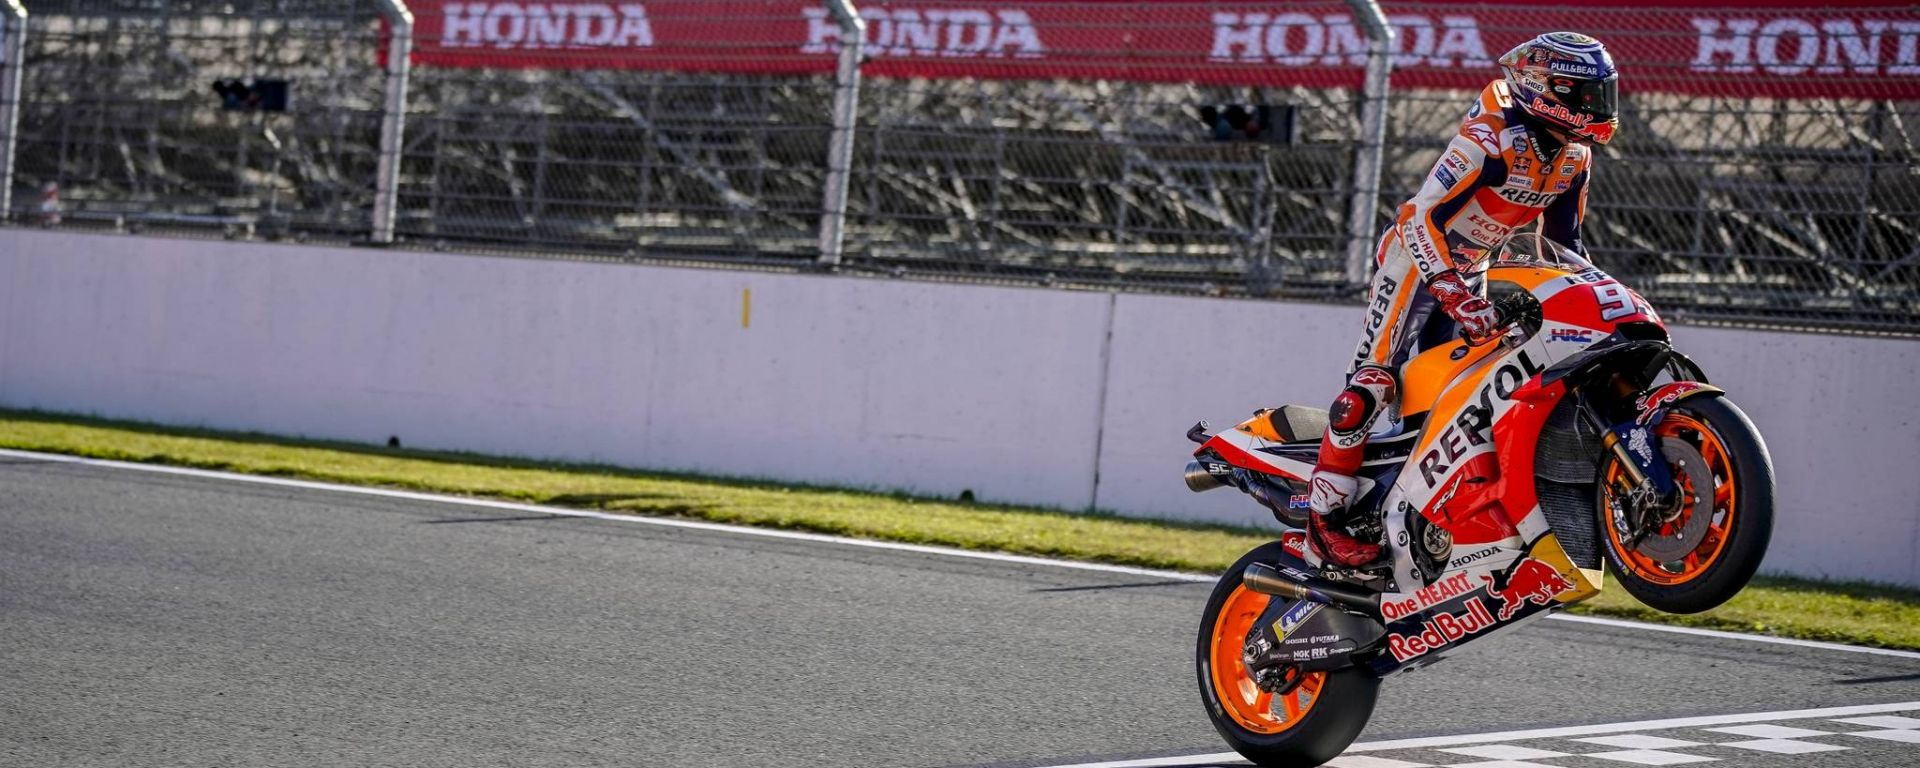 MotoGP Motegi 2018: le pagelle dal Giappone